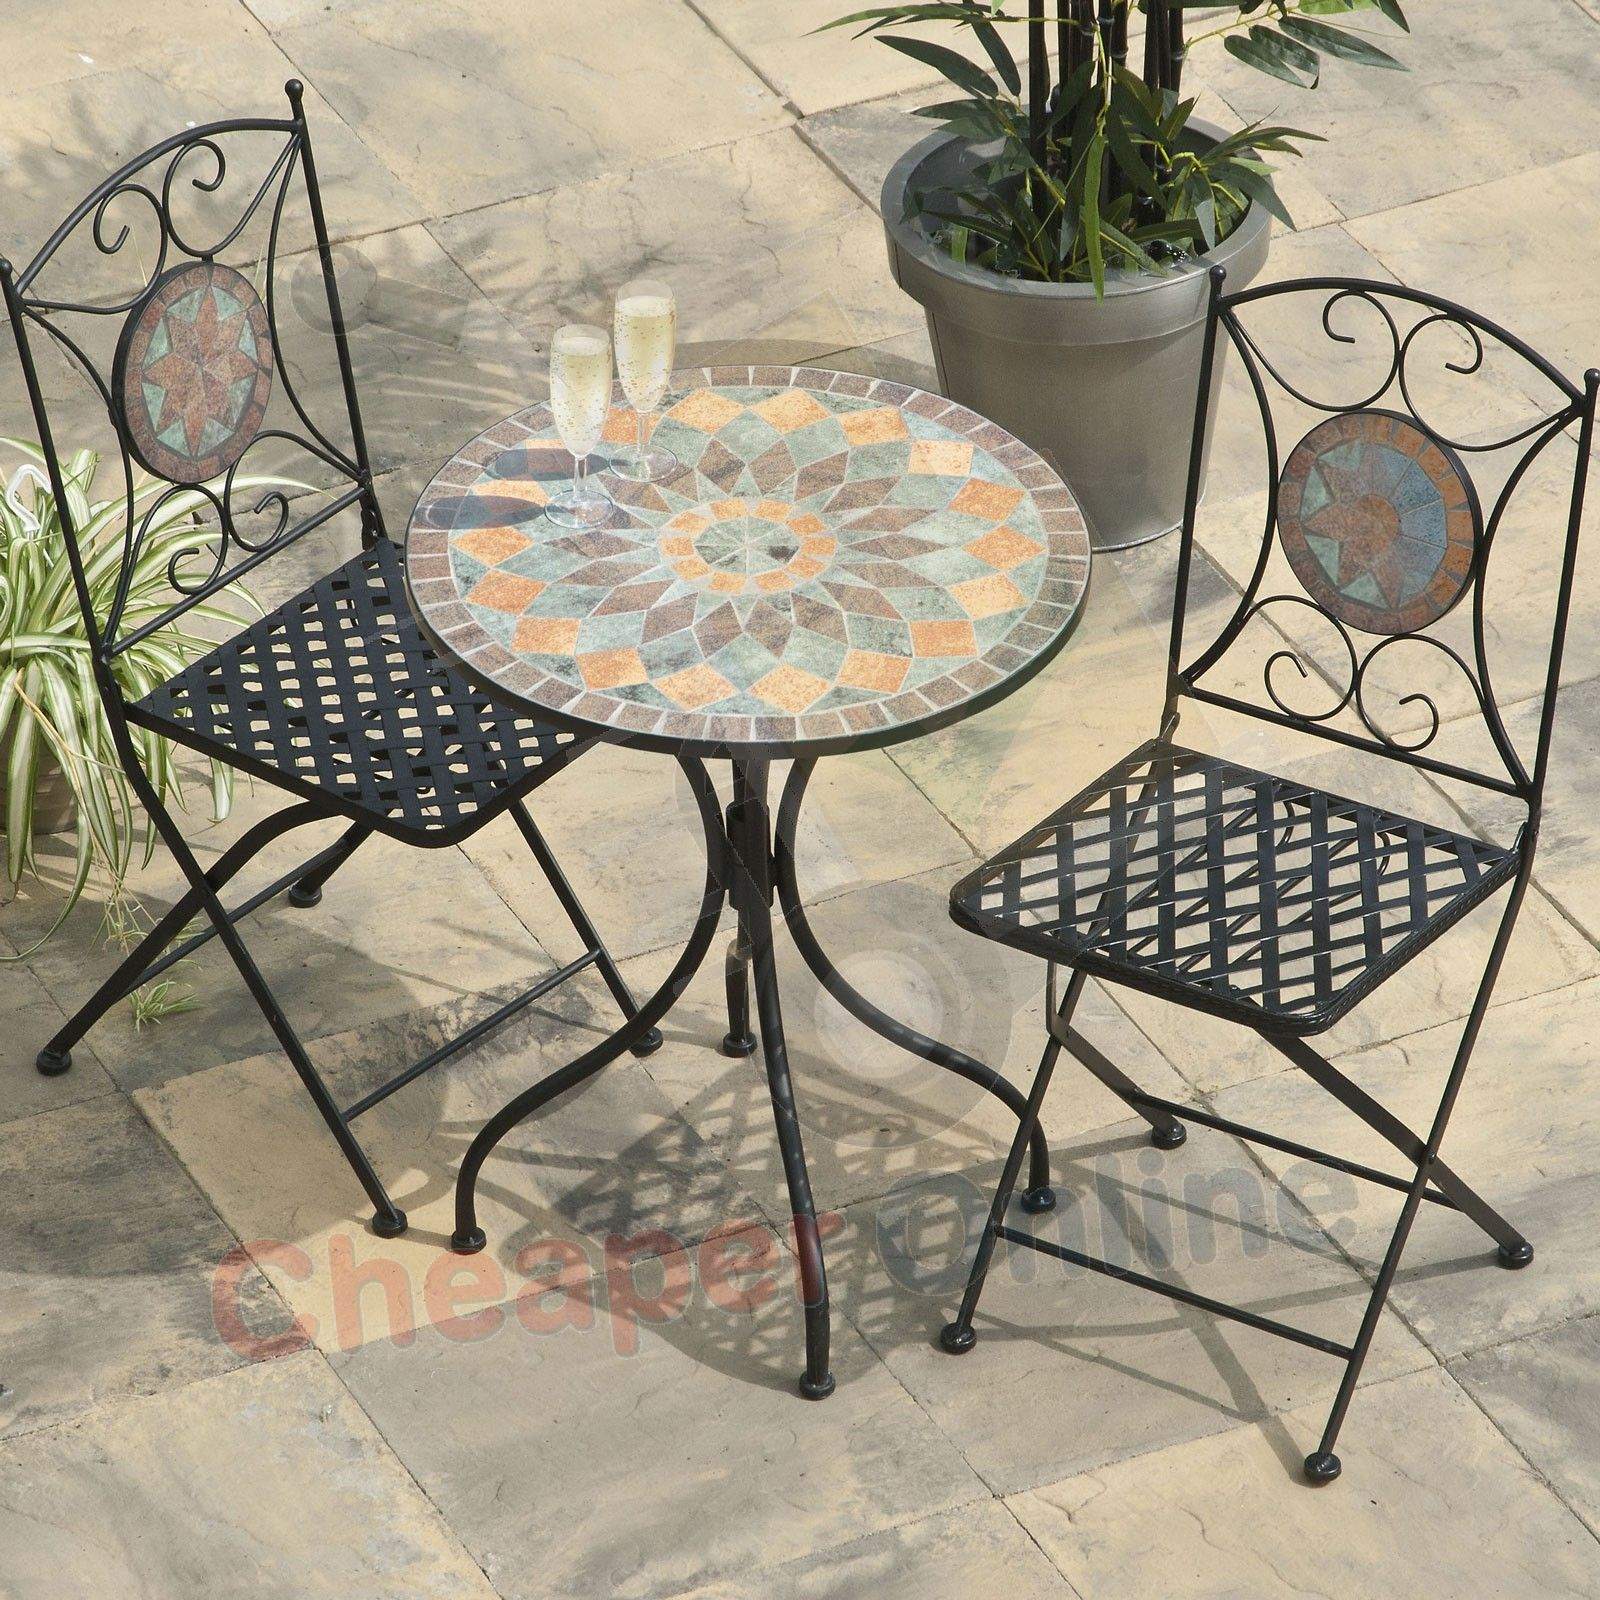 metal patio furniture mosaic - Google Search in 8  Bistro set